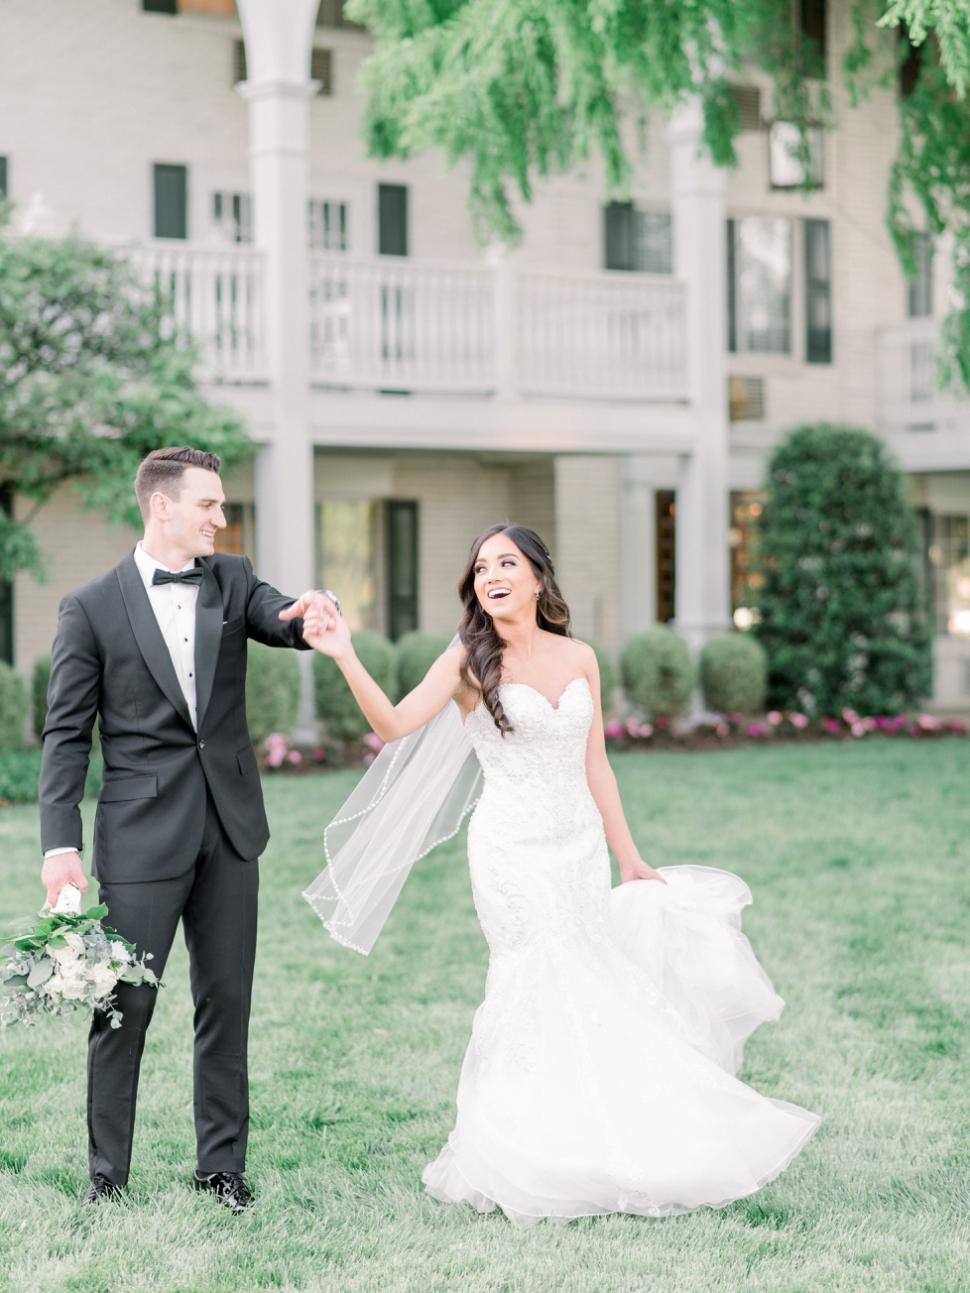 The-Madison-Hotel-Wedding-Photographer-Morristown-NJ-Photographer-Cassi-Claire_16.jpg